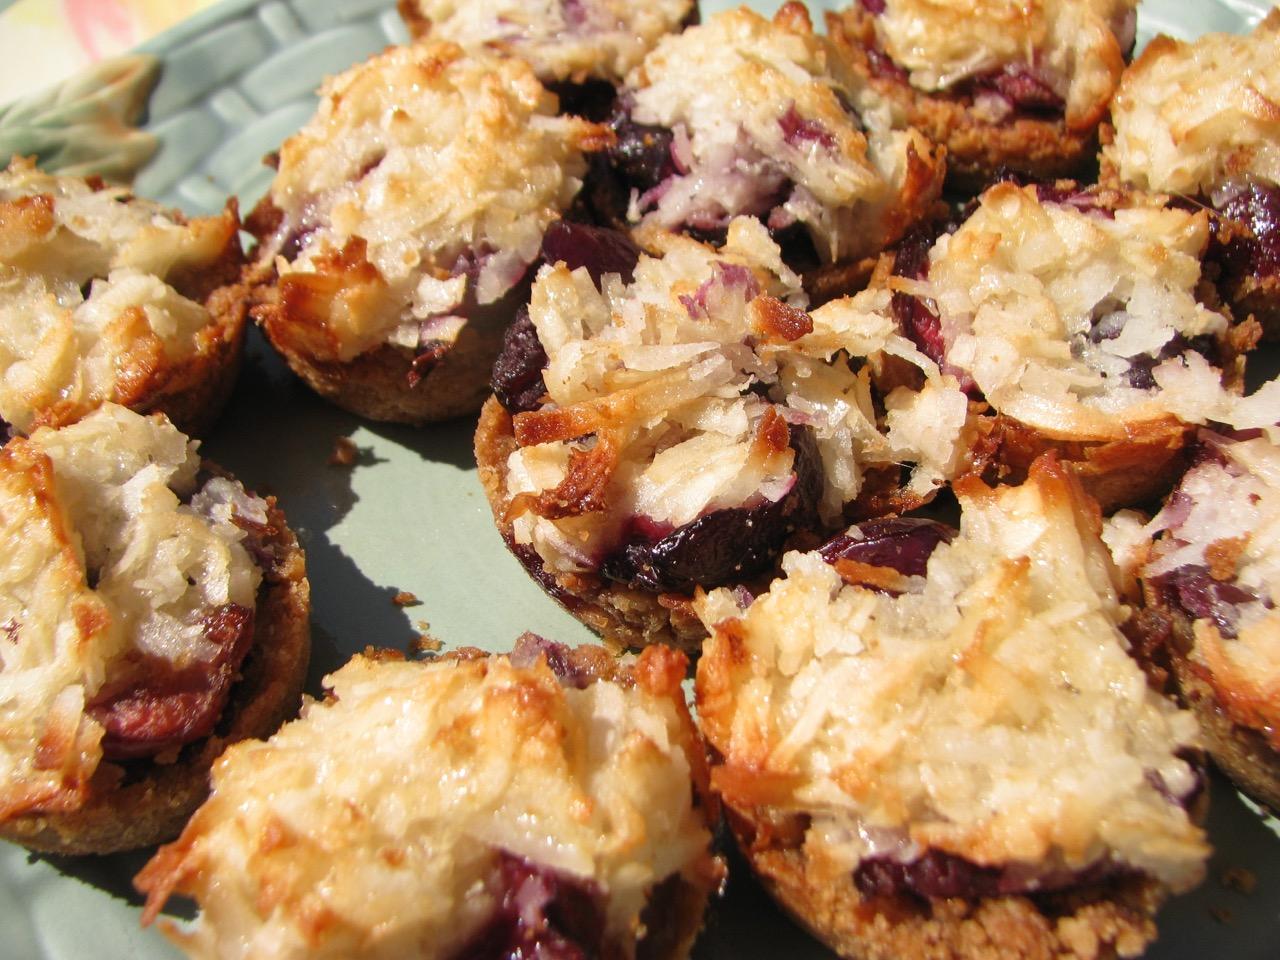 Cherry coconut tarts by Angela Roberts